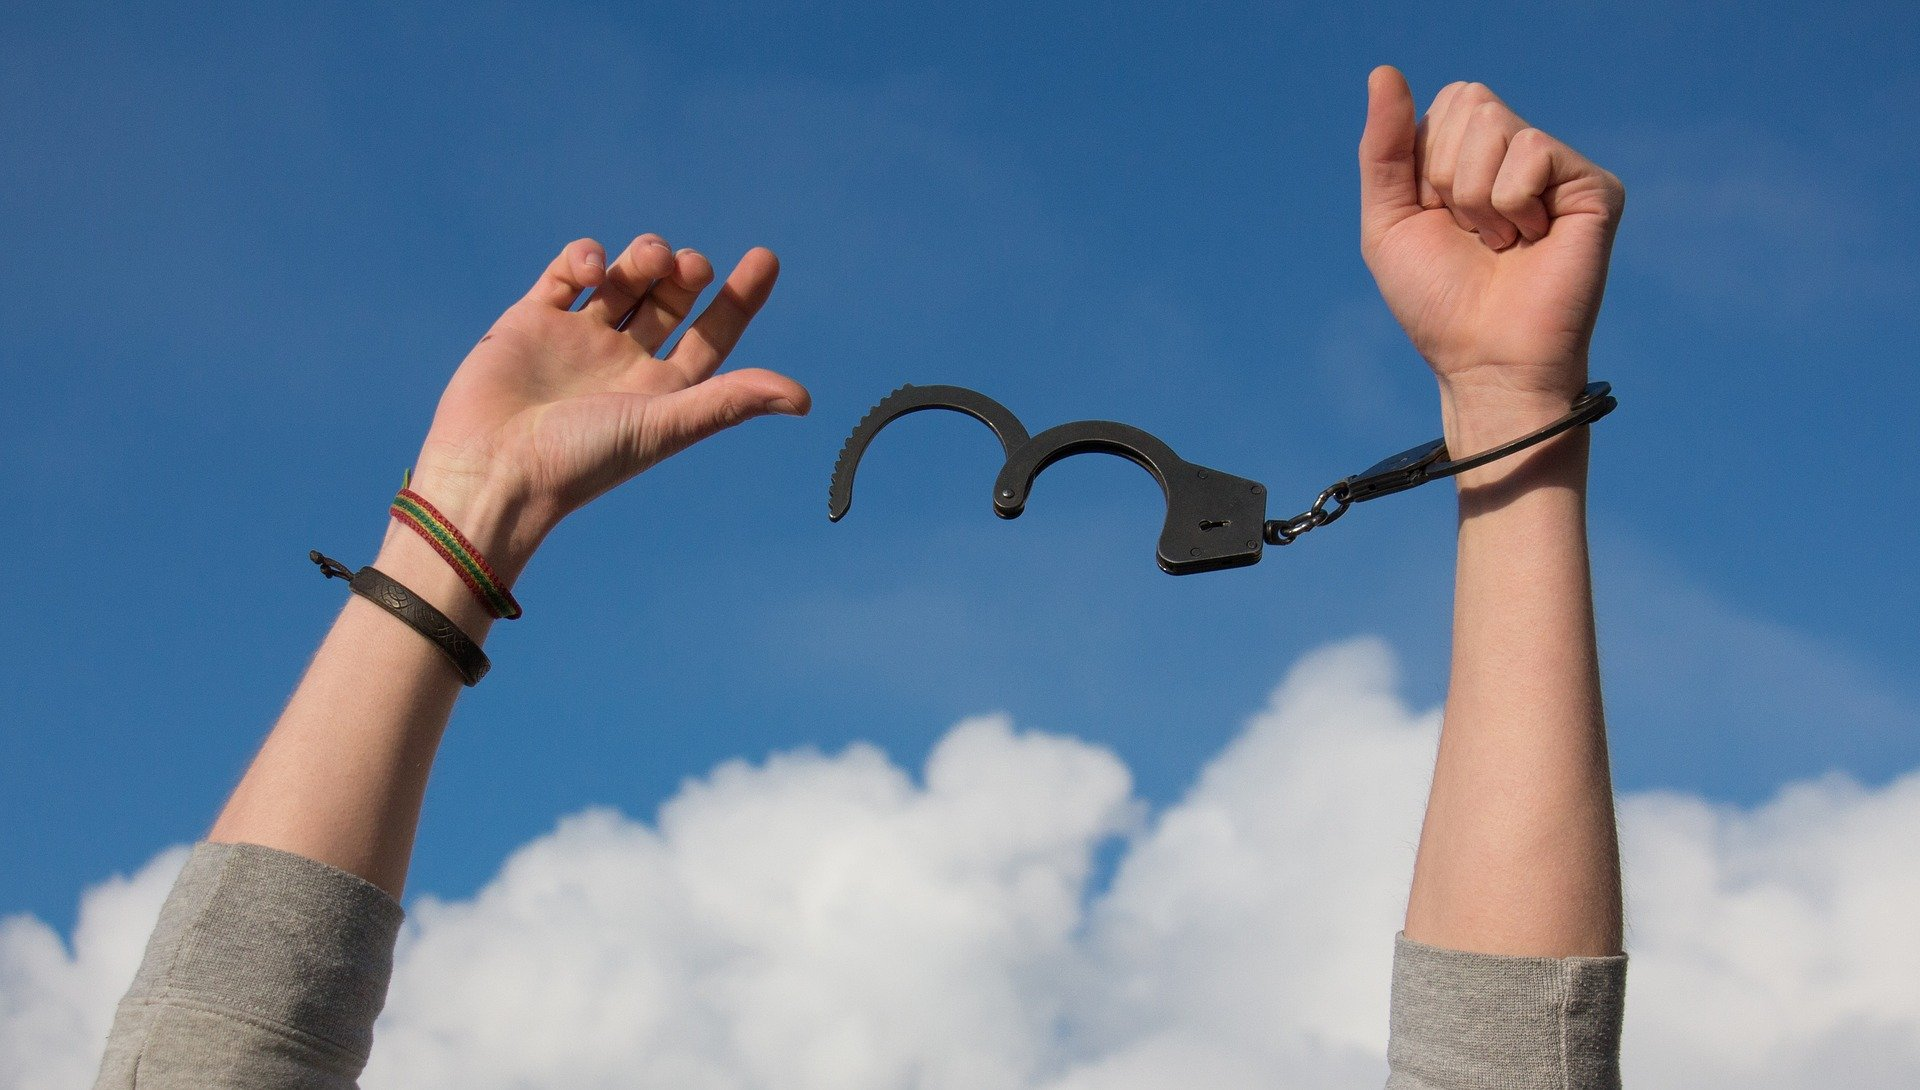 Sky- freedom-hands breaking handcuffs